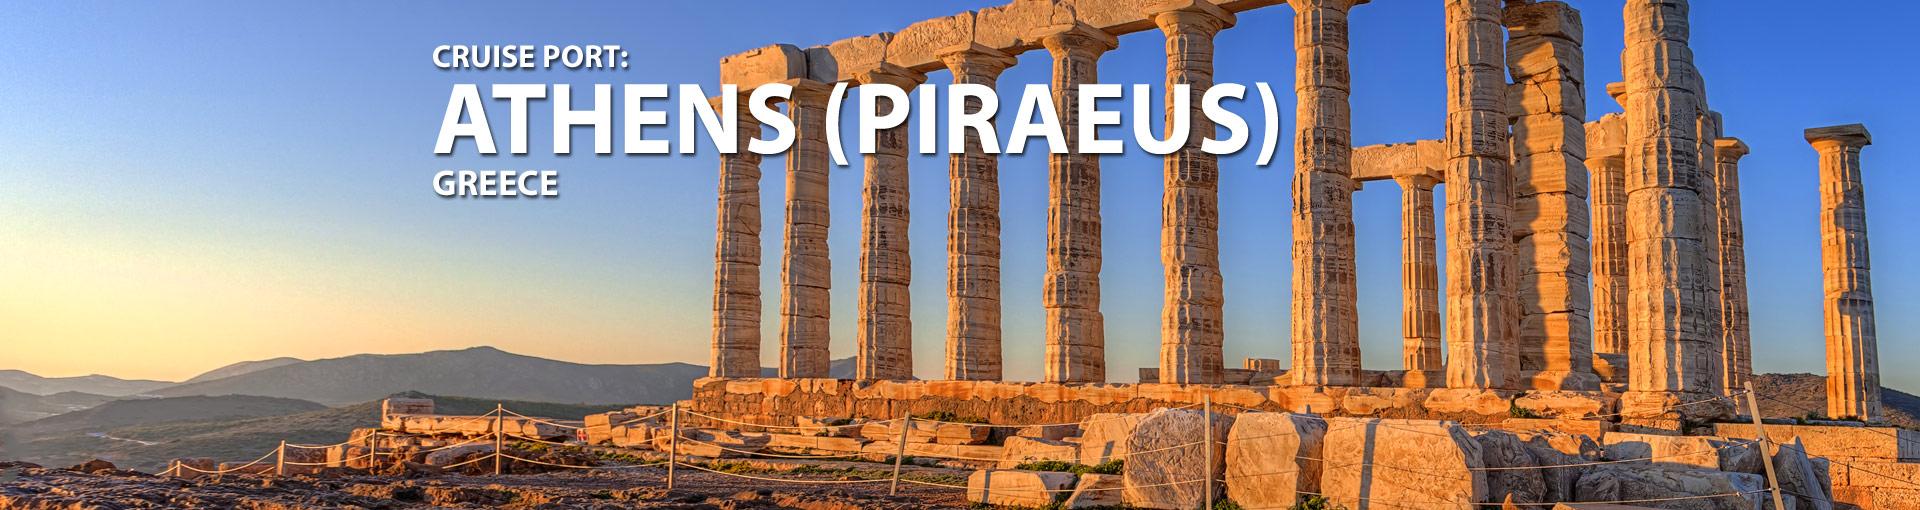 Piraeus Athens Greece Cruise Port 2017 And 2018